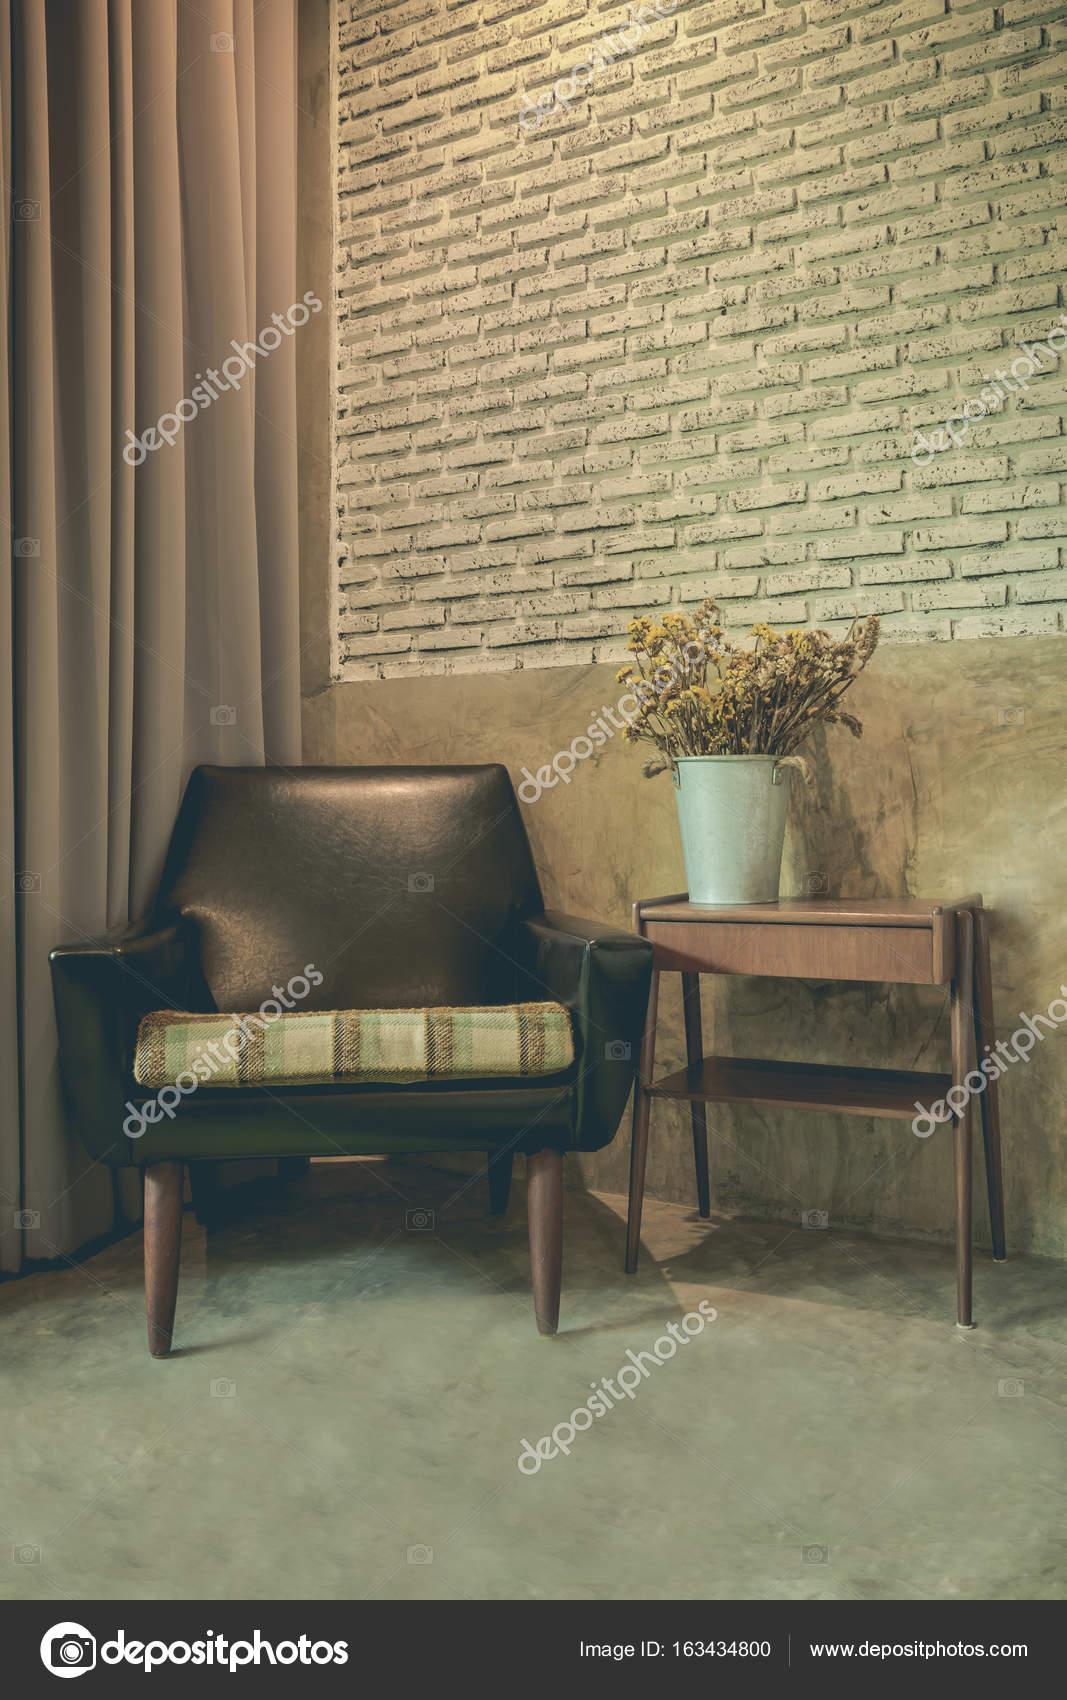 Vintage kamer met oude gips muren en oude ouderwetse fauteuil ...